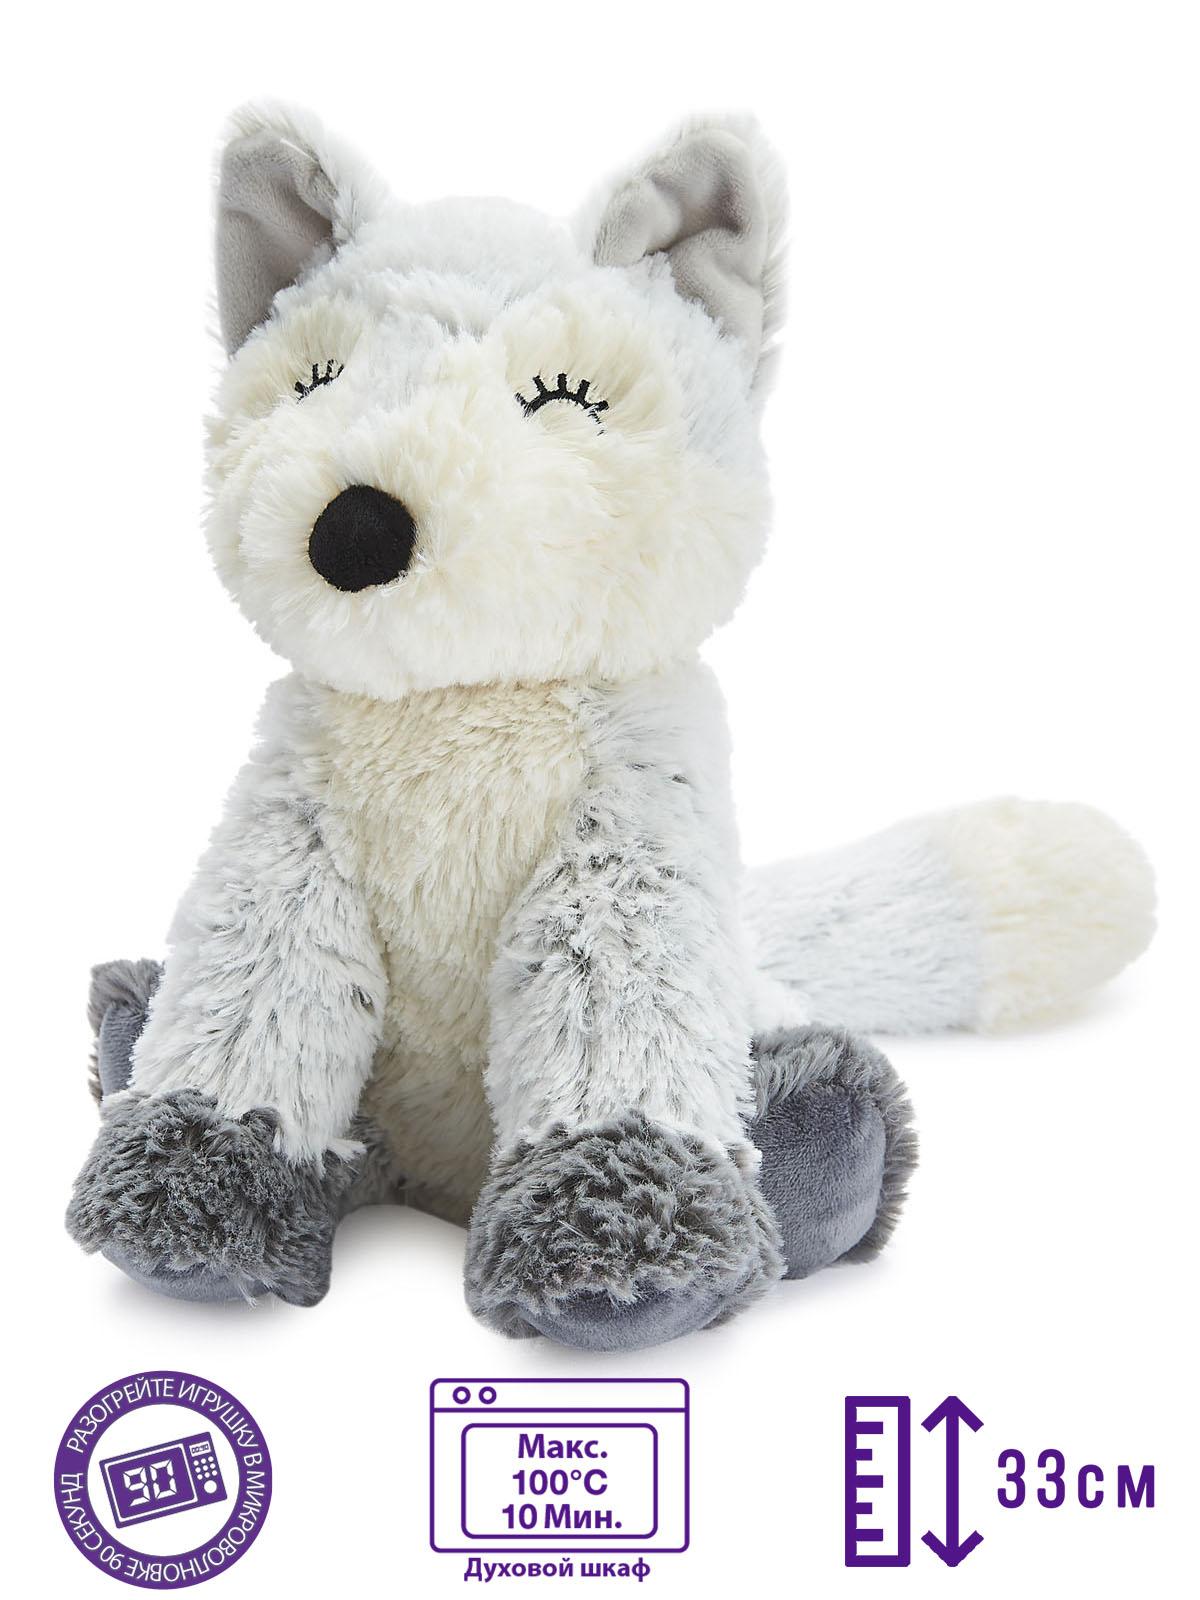 Пинкл (Pinkl) | Игрушка-грелка Marshmallow Лиса | Intelex Warmies Cozy Plush Marshmallow Fox